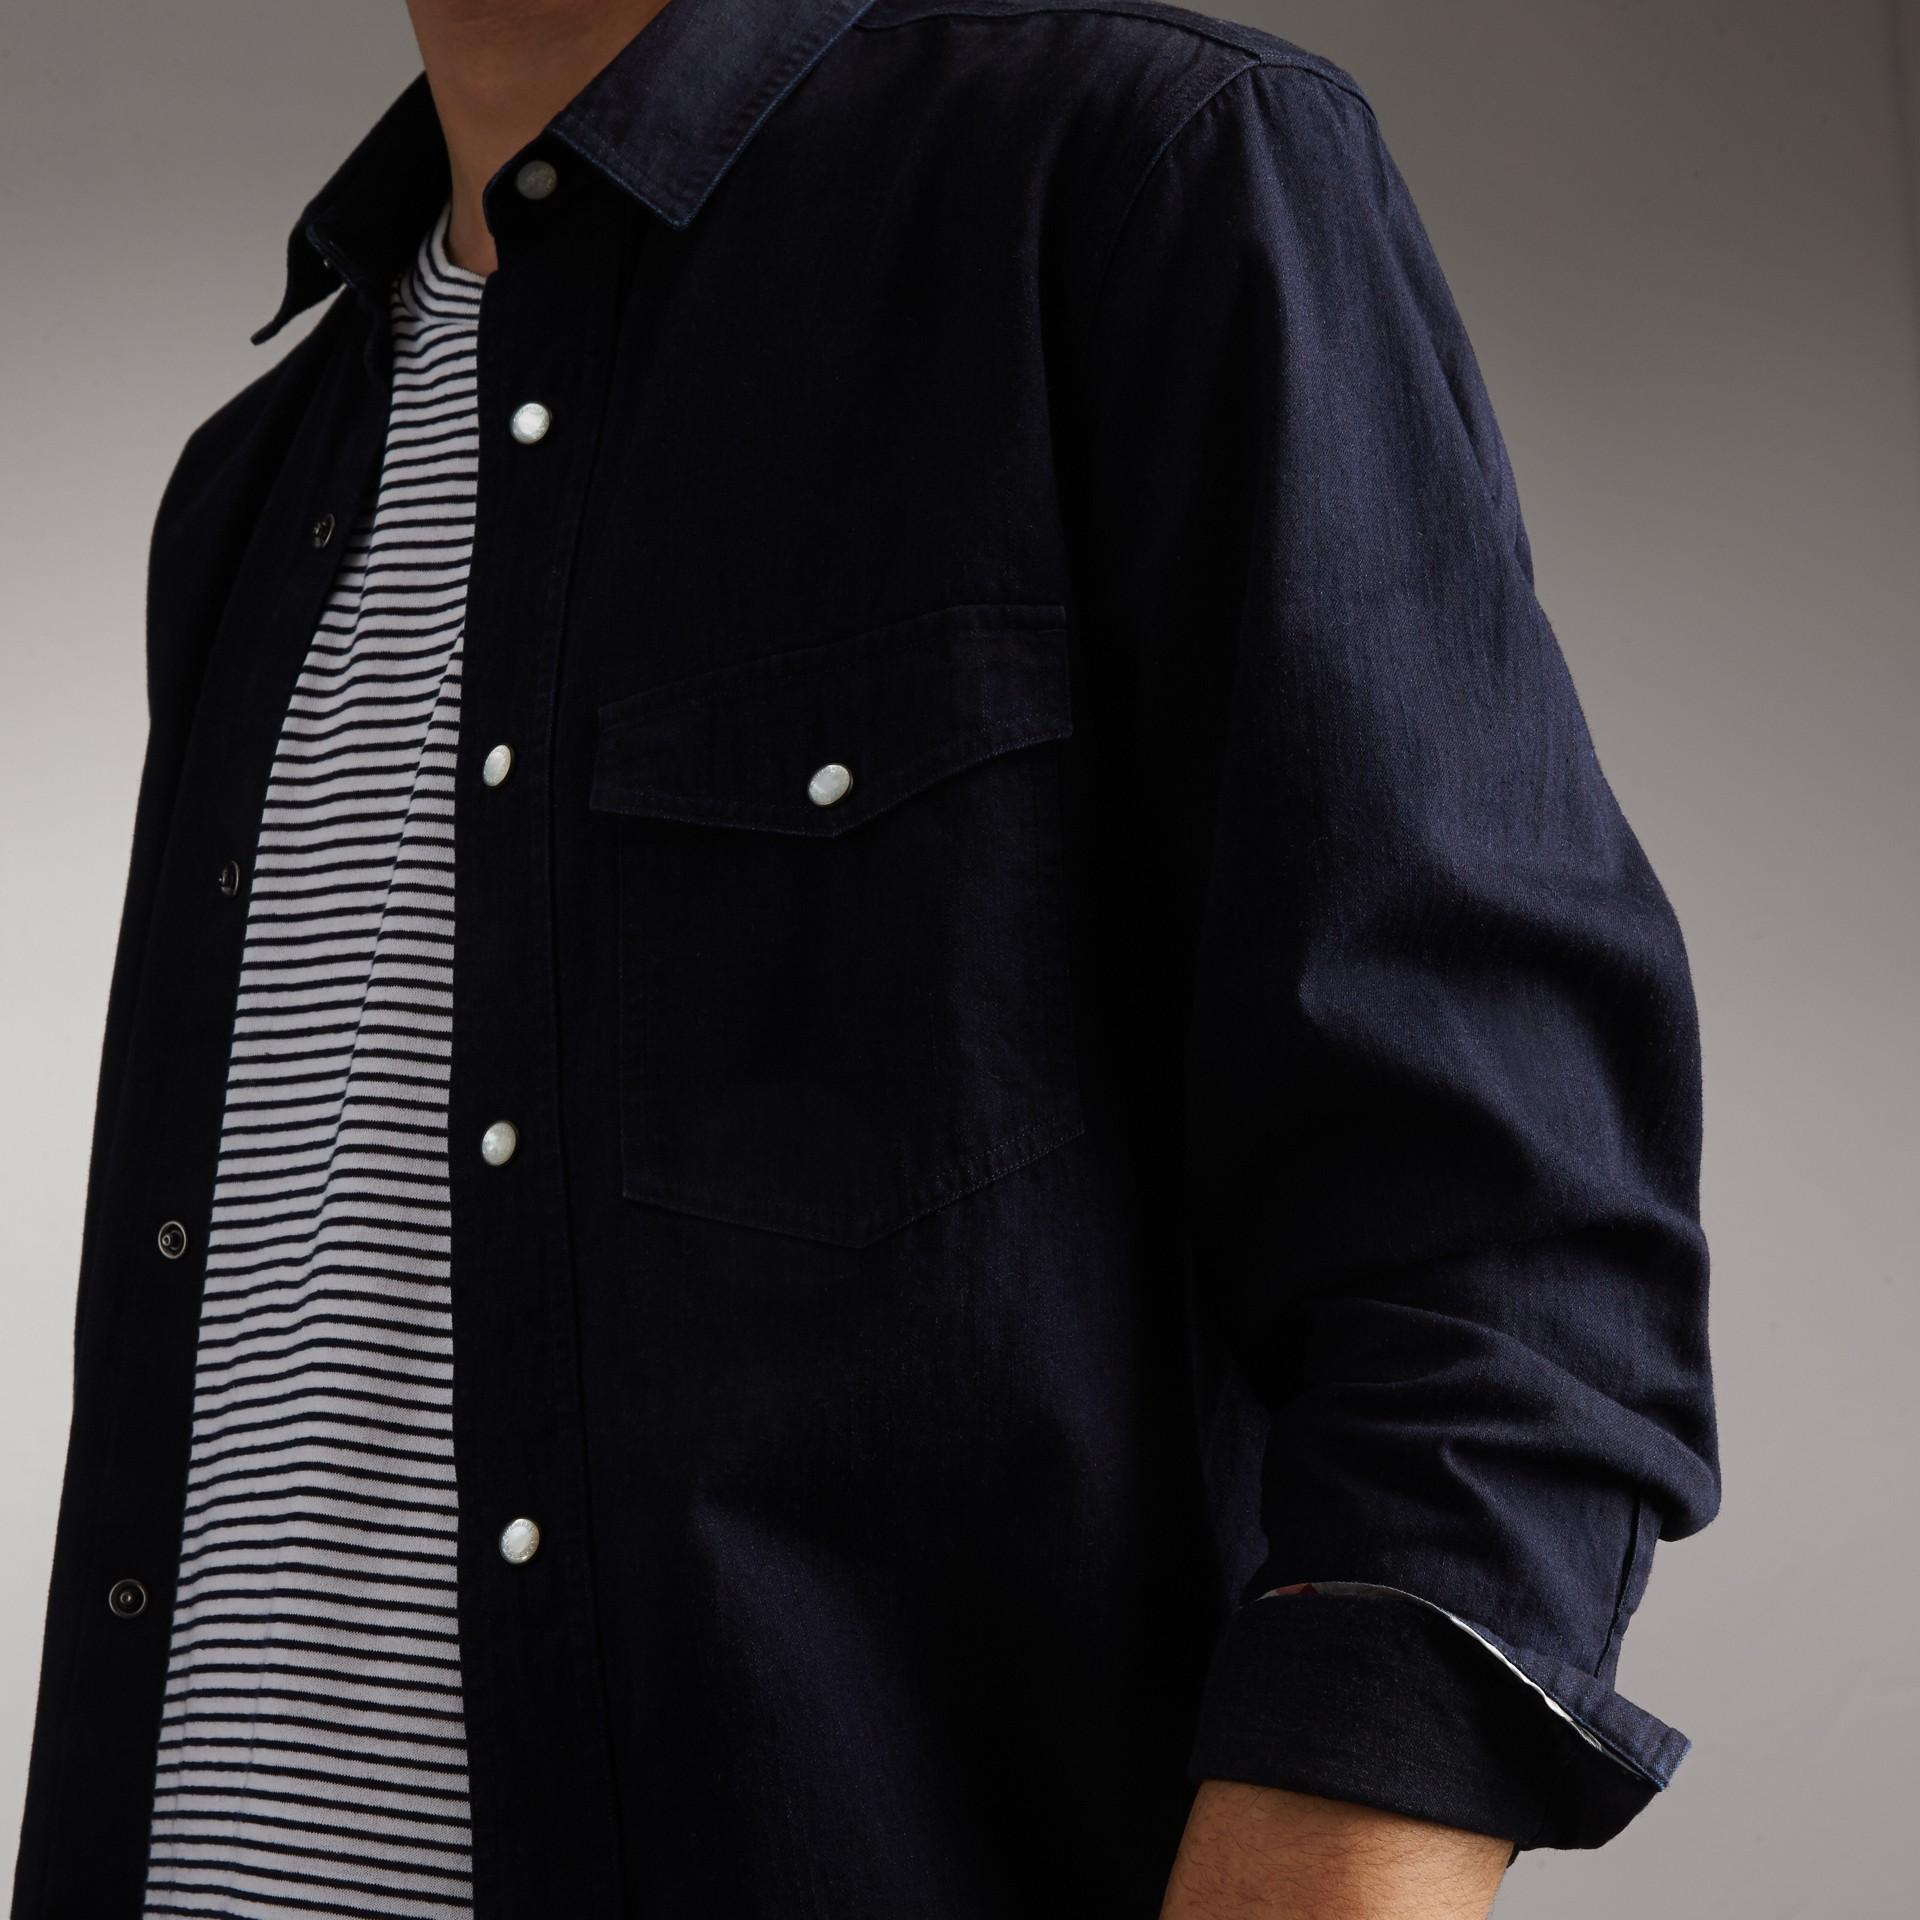 Japanese Denim Shirt in Indigo - Men | Burberry United States - gallery image 1